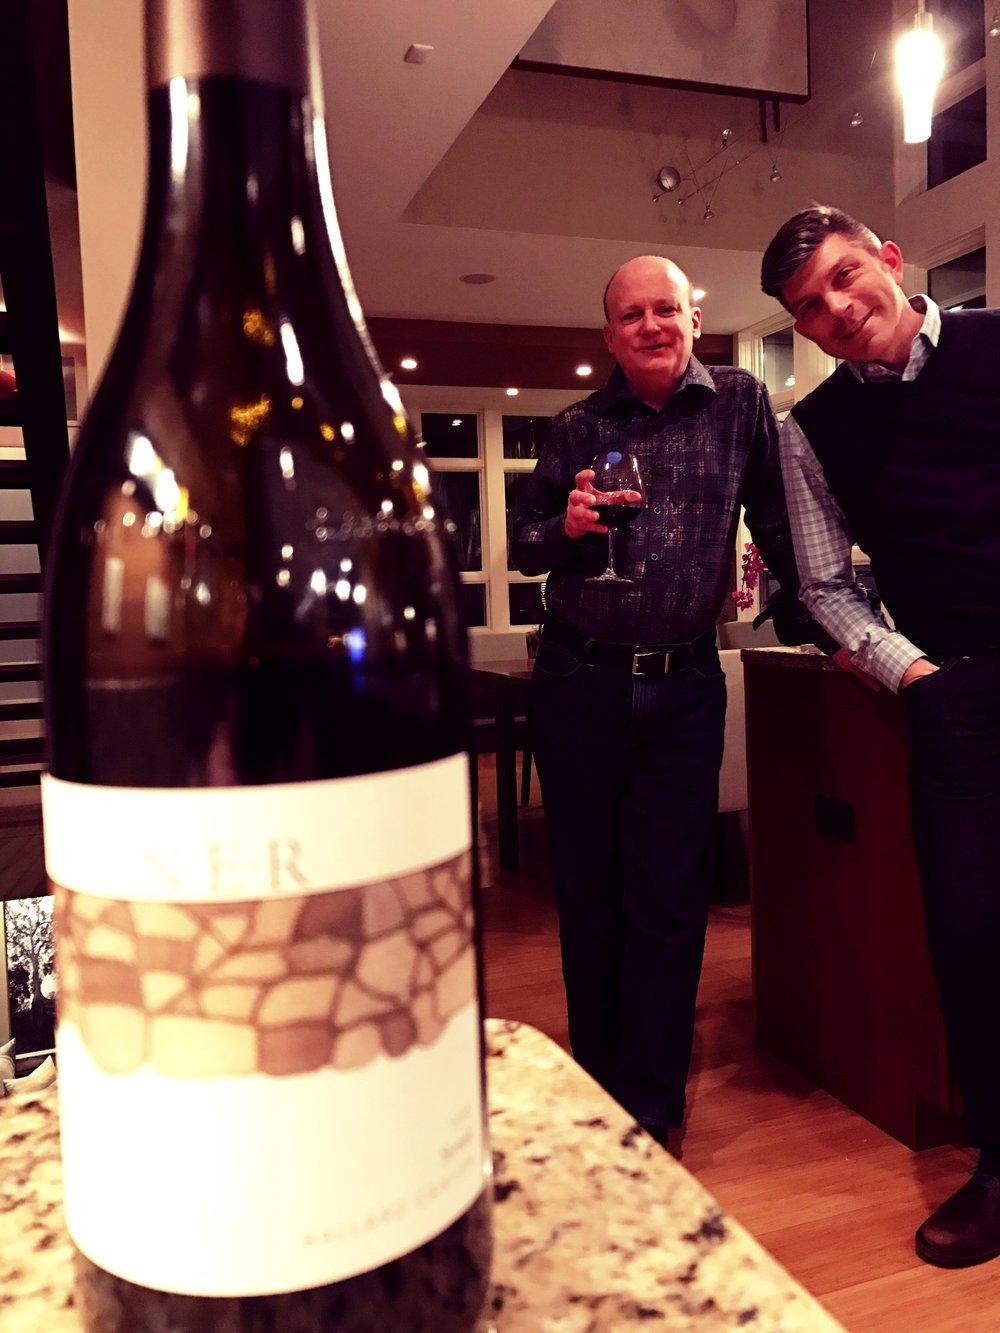 Leonard and John at the house